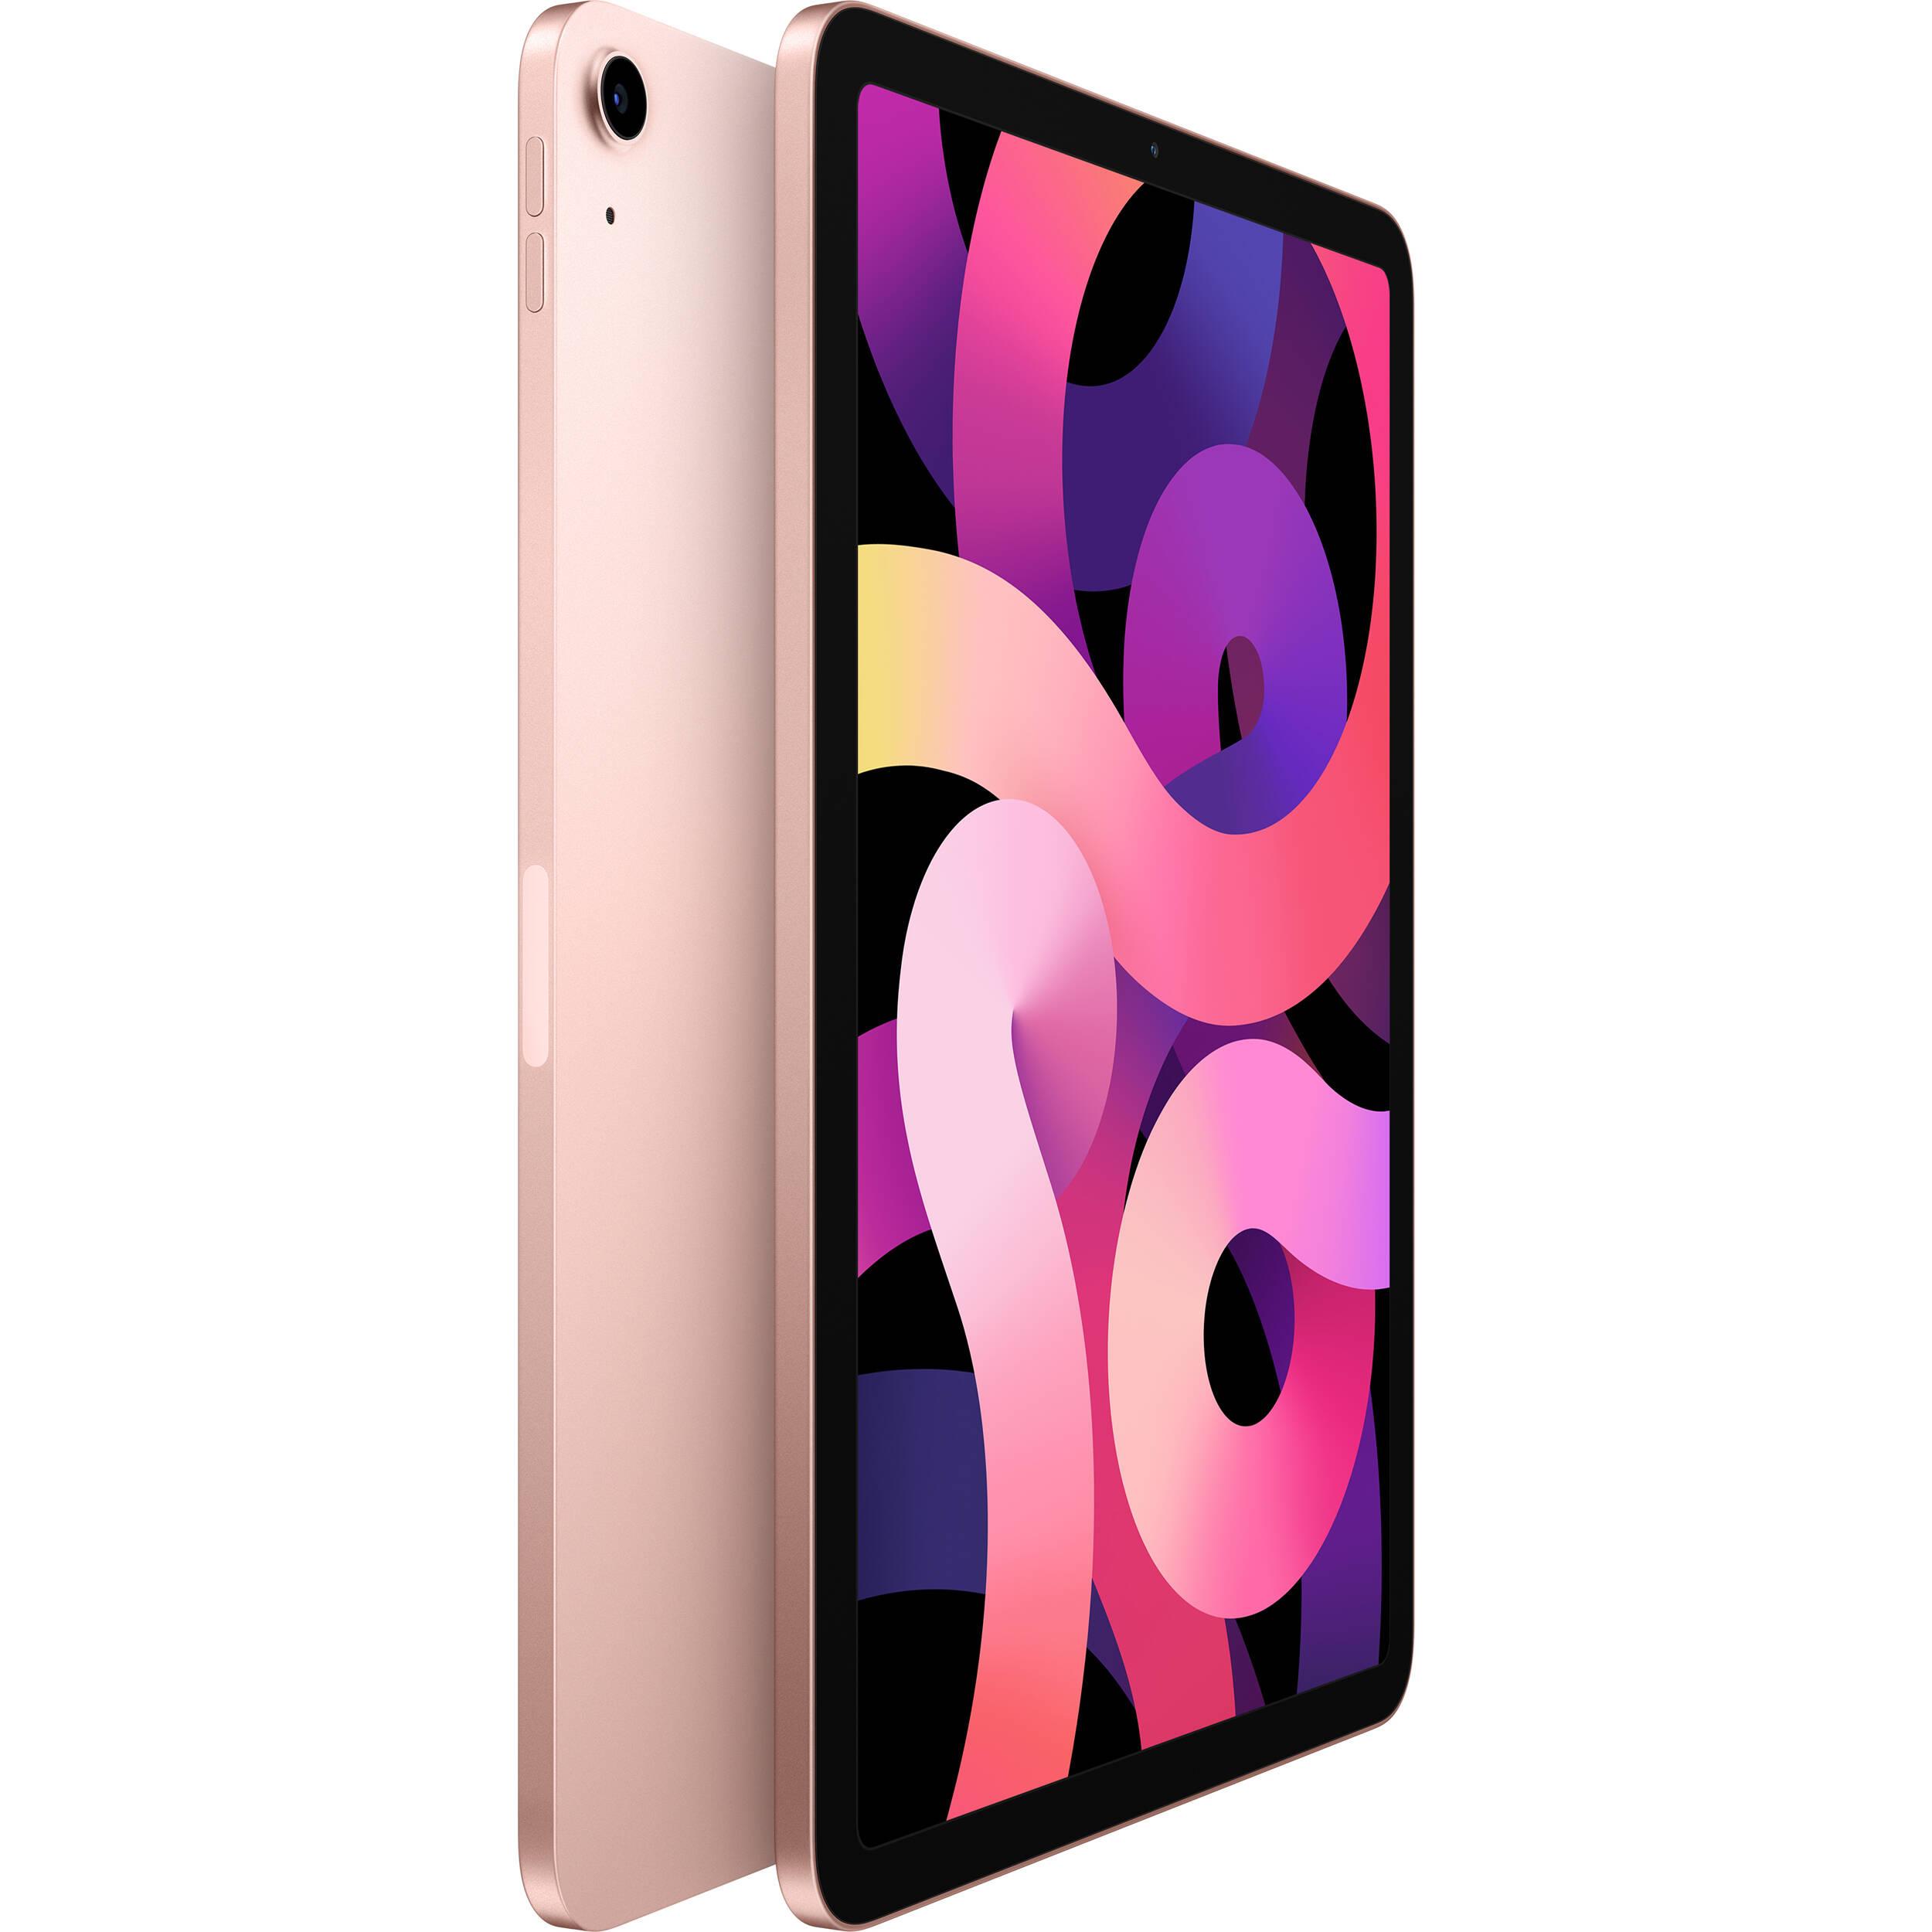 تبلت اپل مدل iPad Air 10.9 inch 2020 WiFi ظرفیت 256 گیگابایت  thumb 11